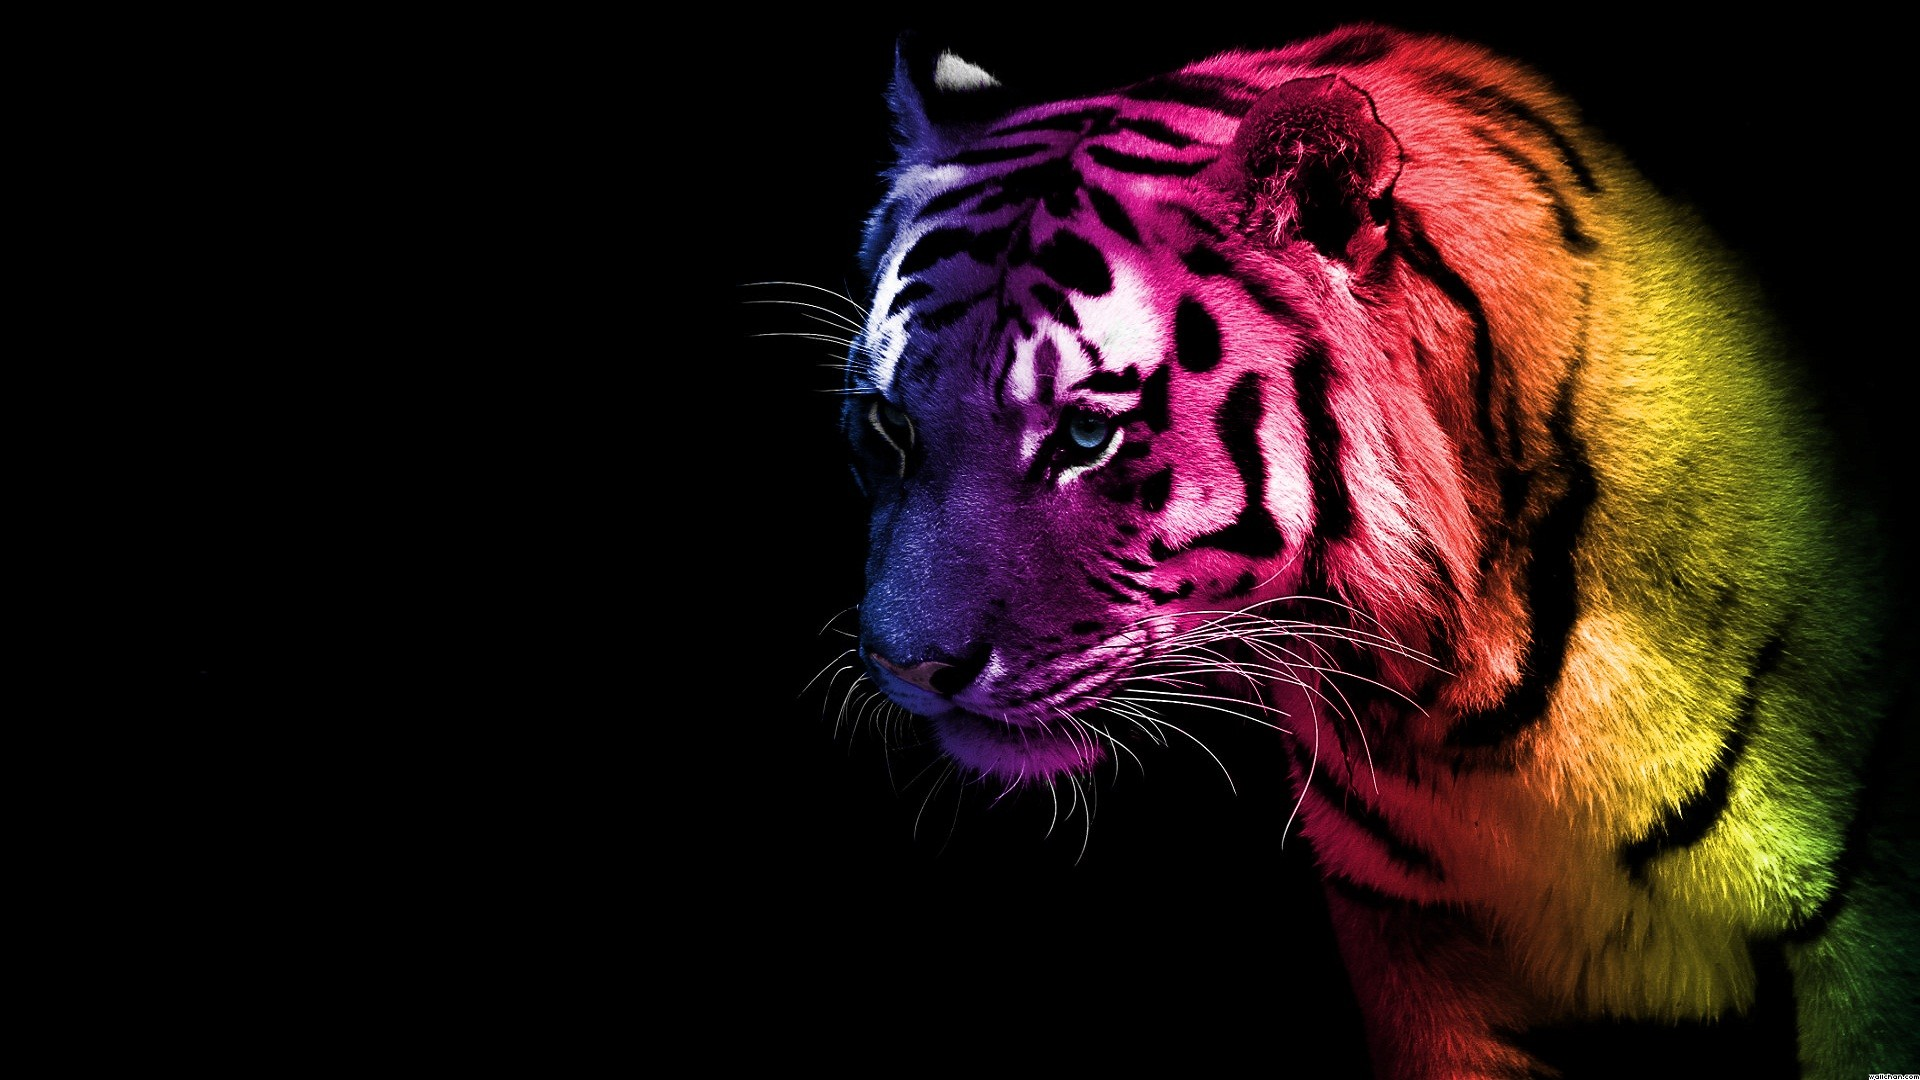 purple fantasy | Tiger – animals, color, tiger, wallpaper – Full HD Best